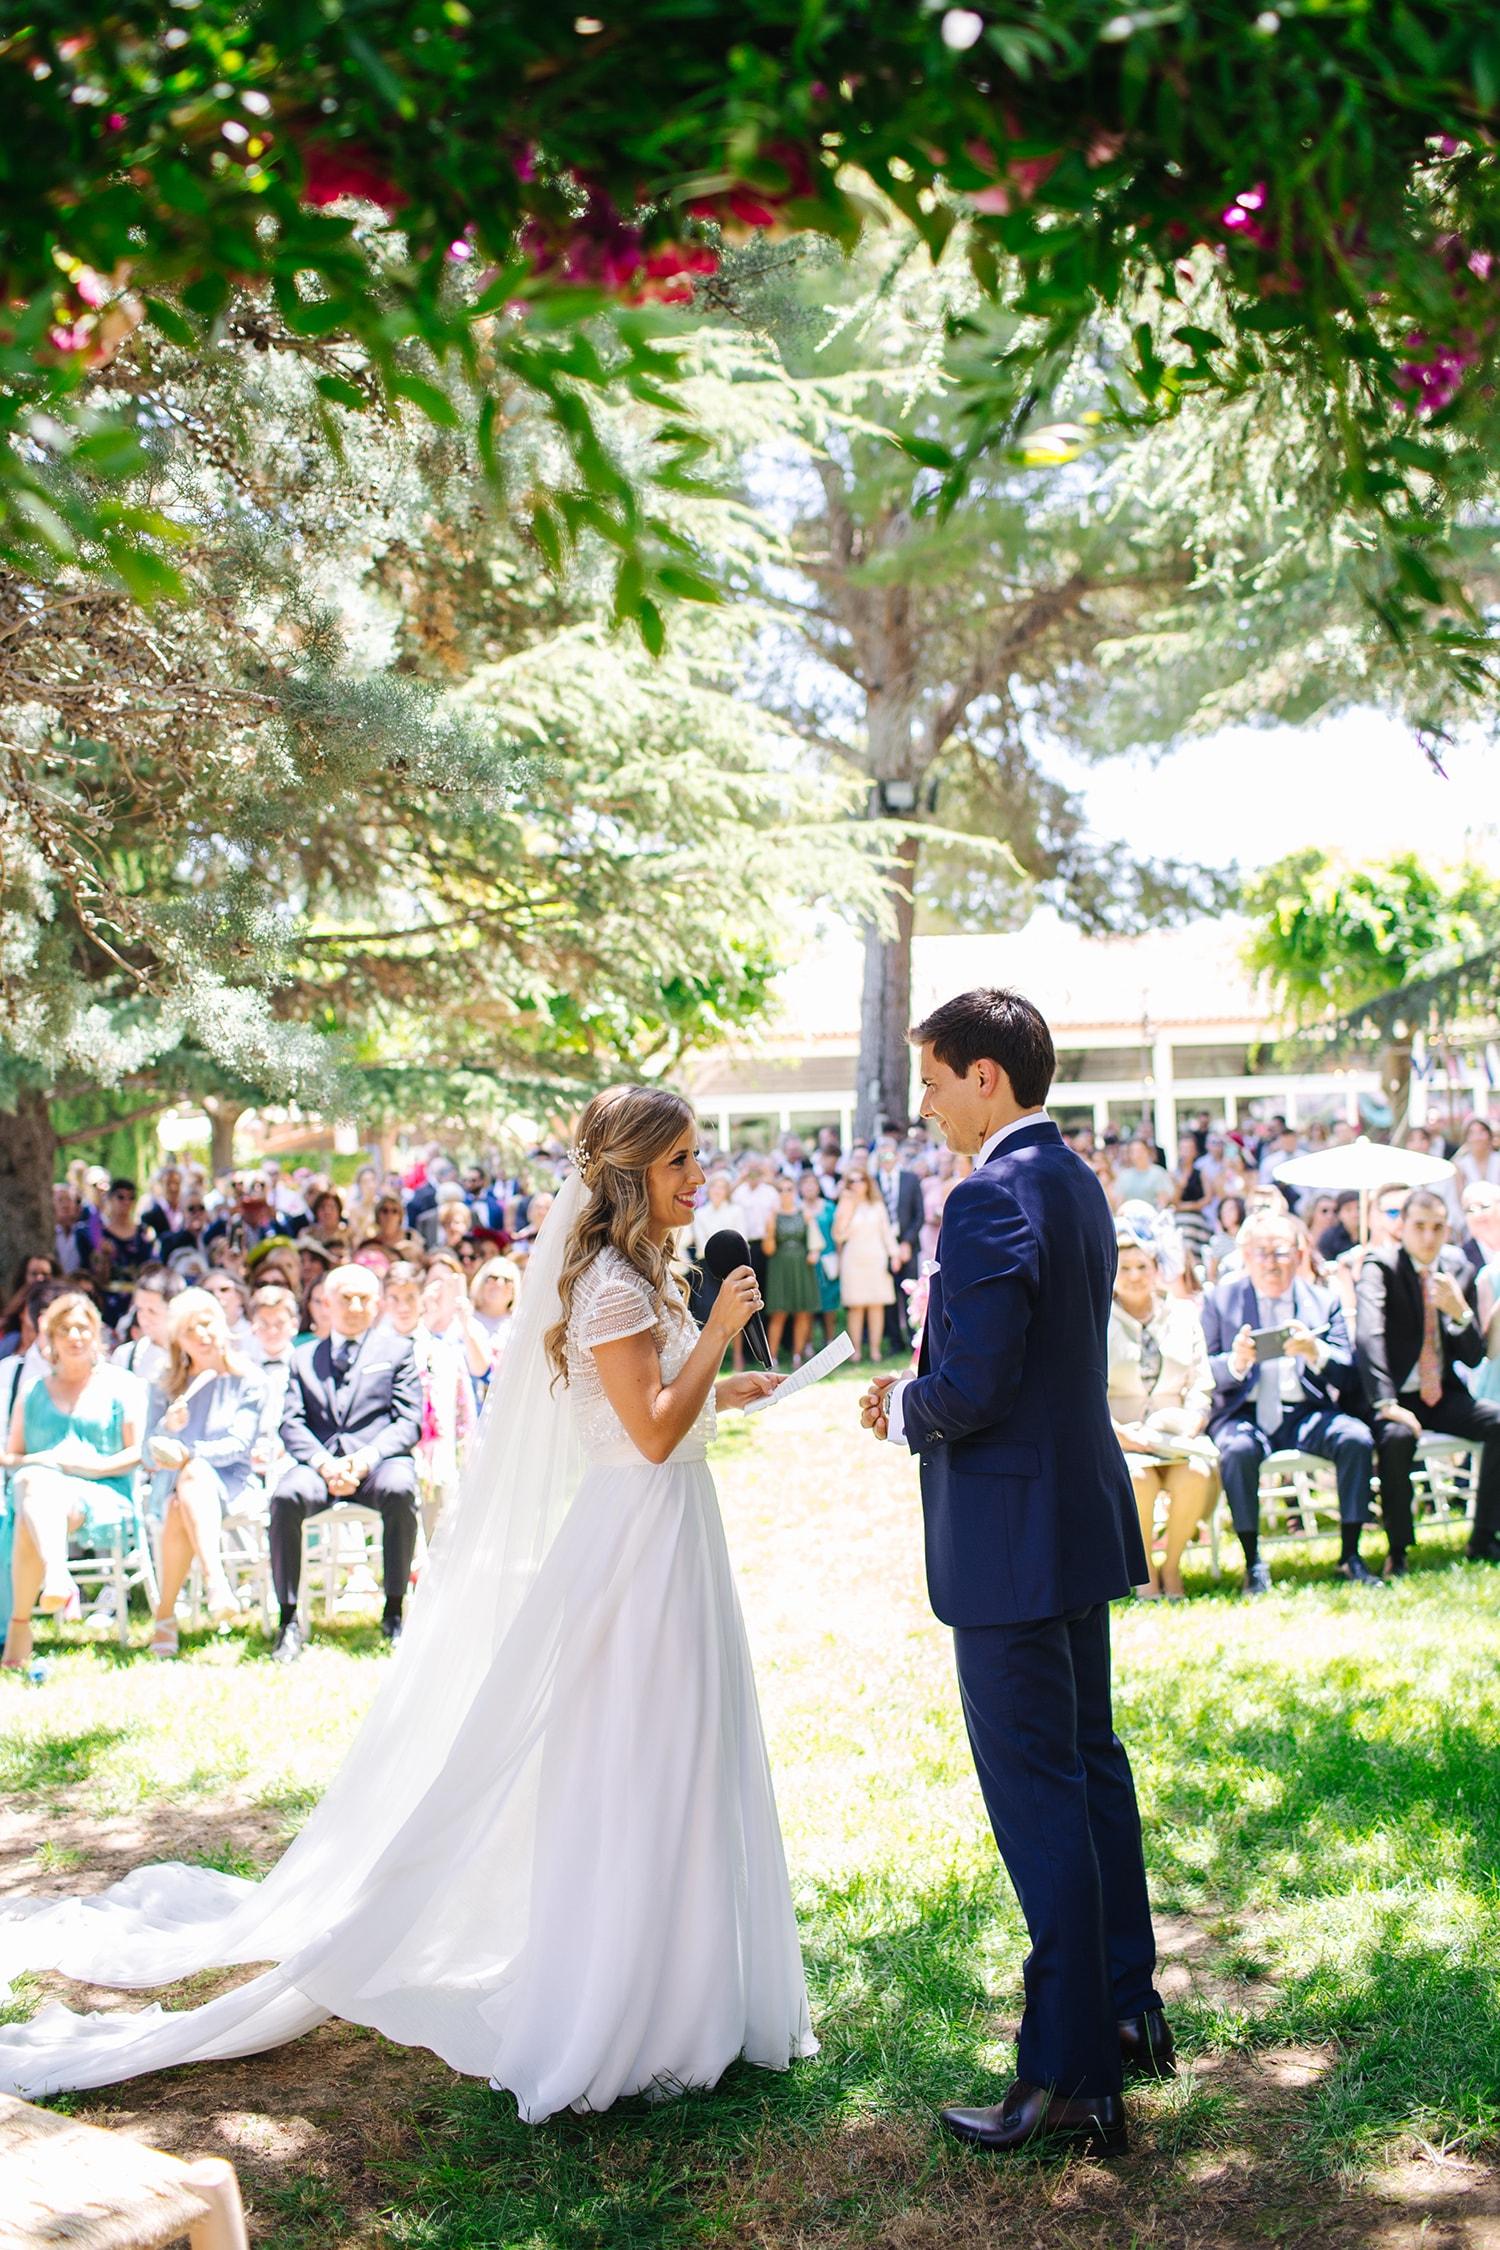 paulagfurio_bouganvillea_wedding_spain_024.jpg